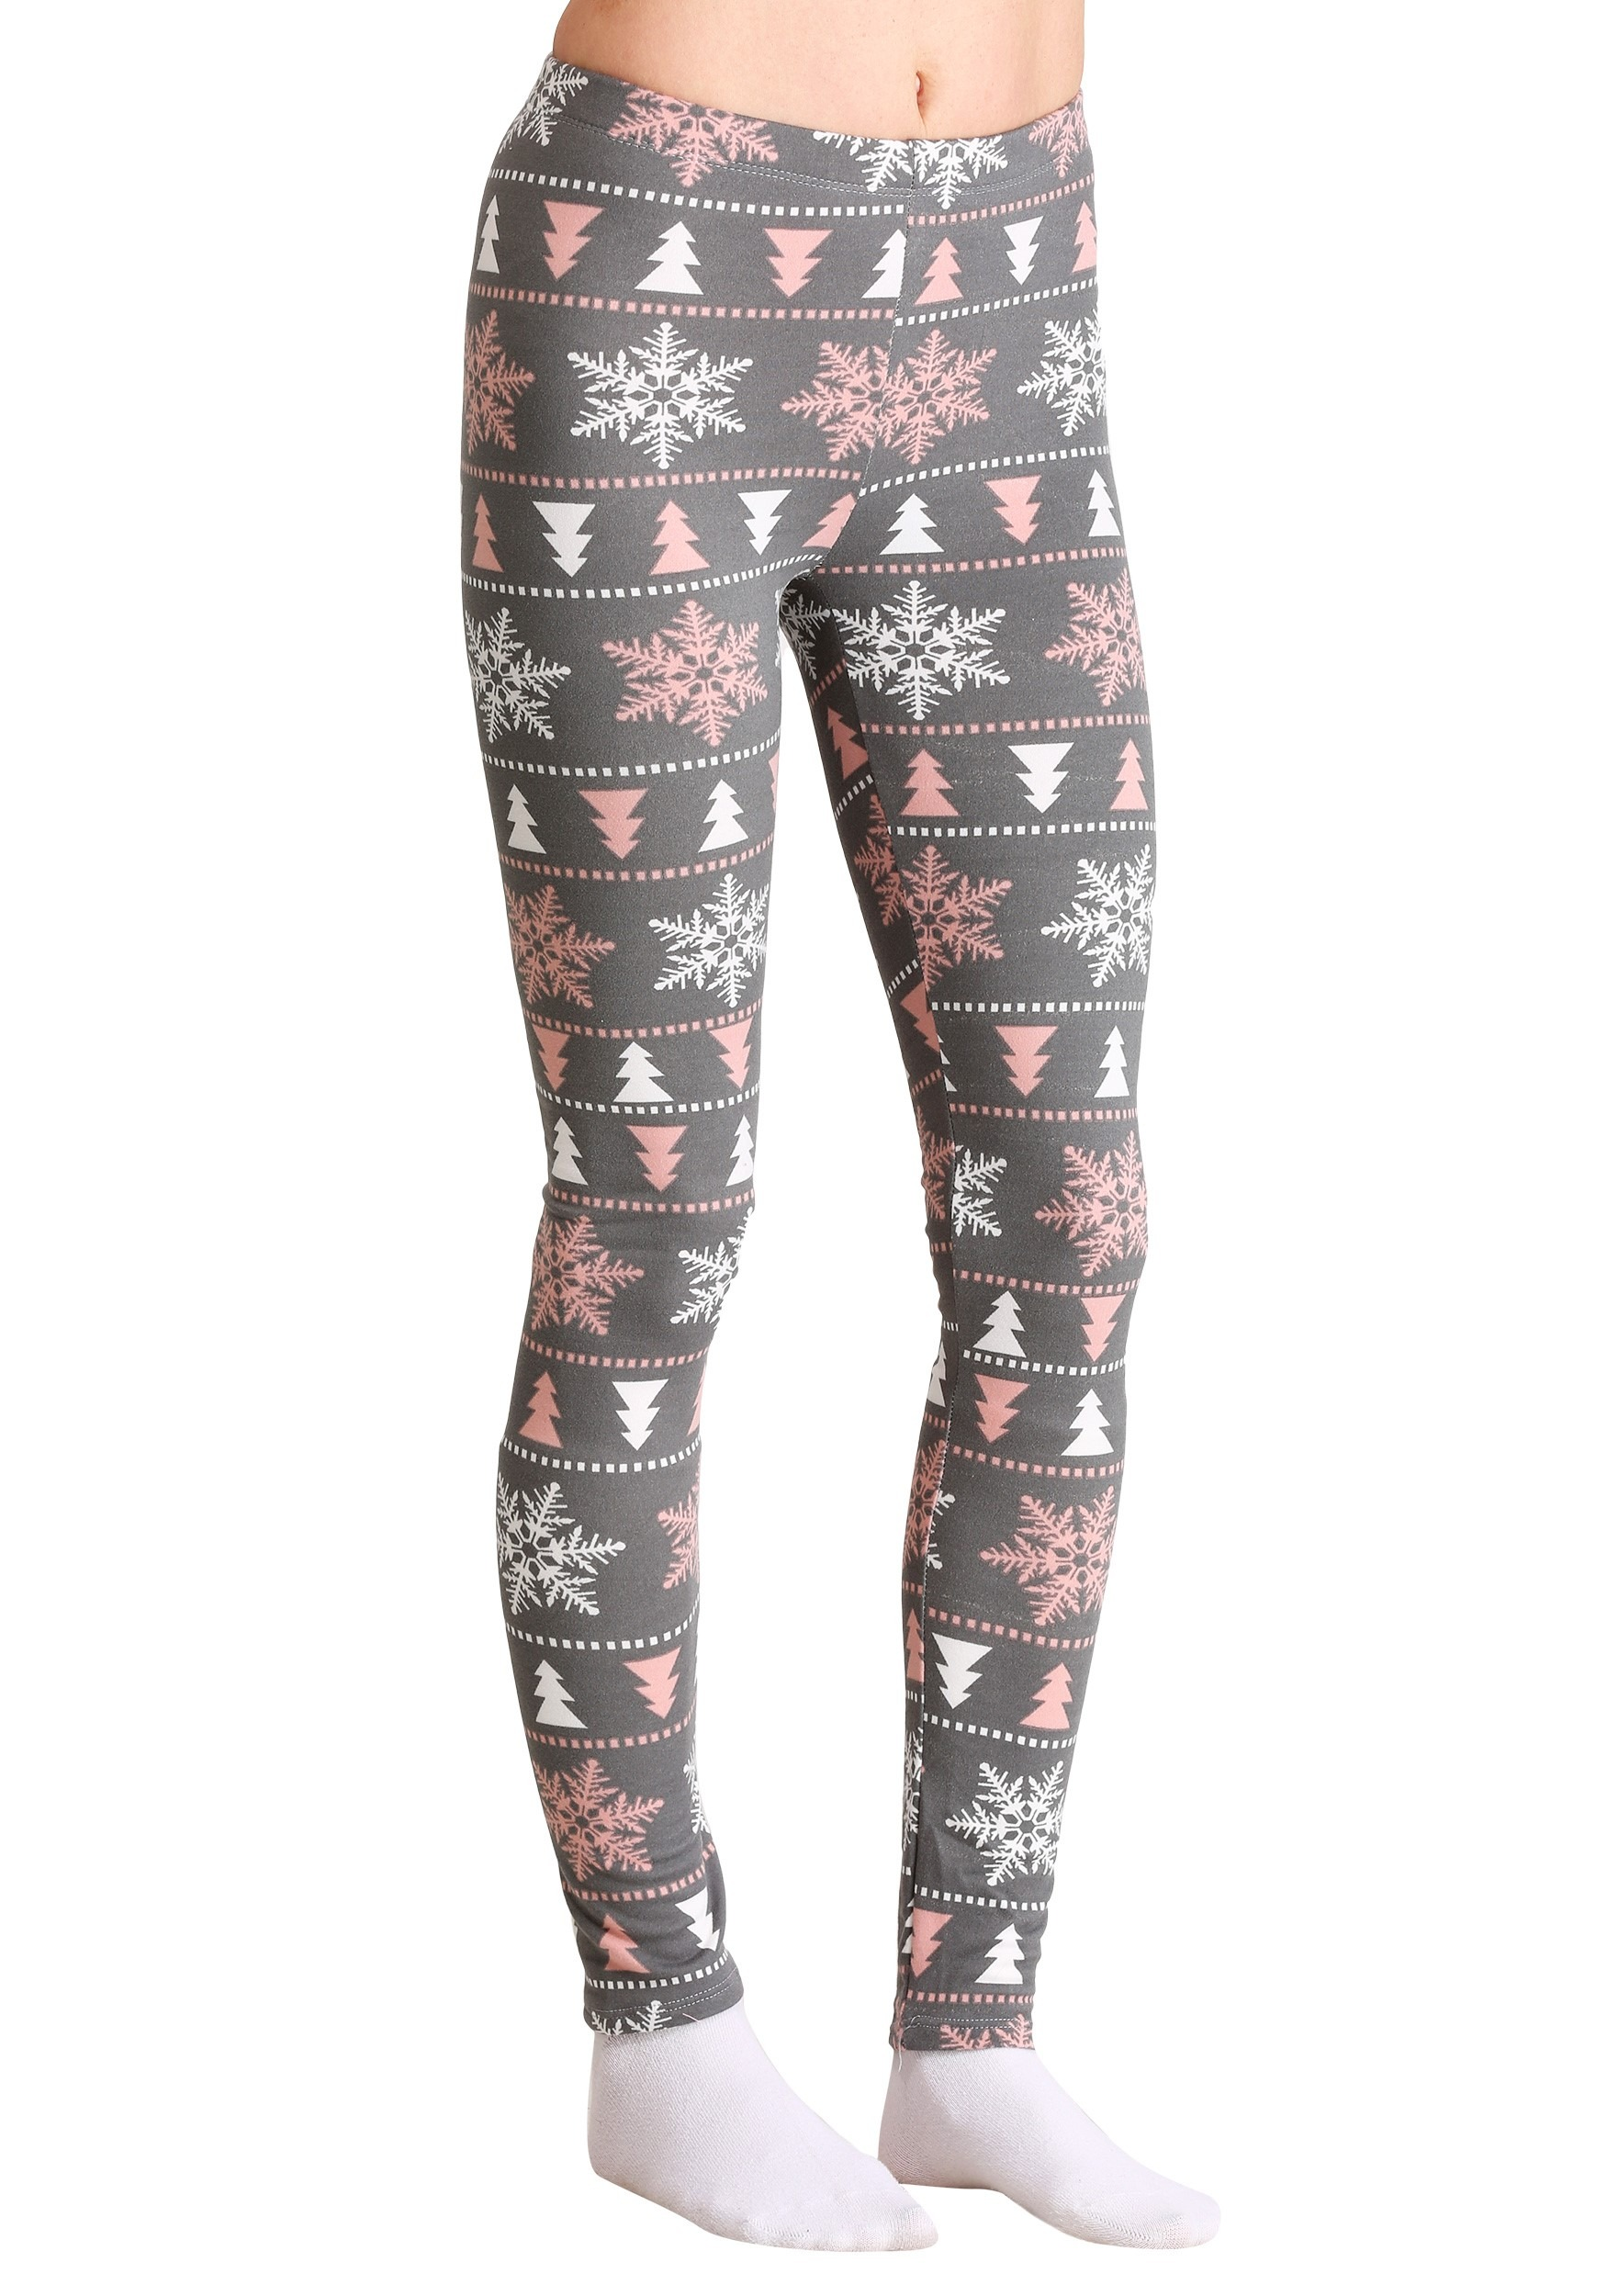 Ugly Christmas Pink & White Snowflake Pattern Gray Women's Leggings